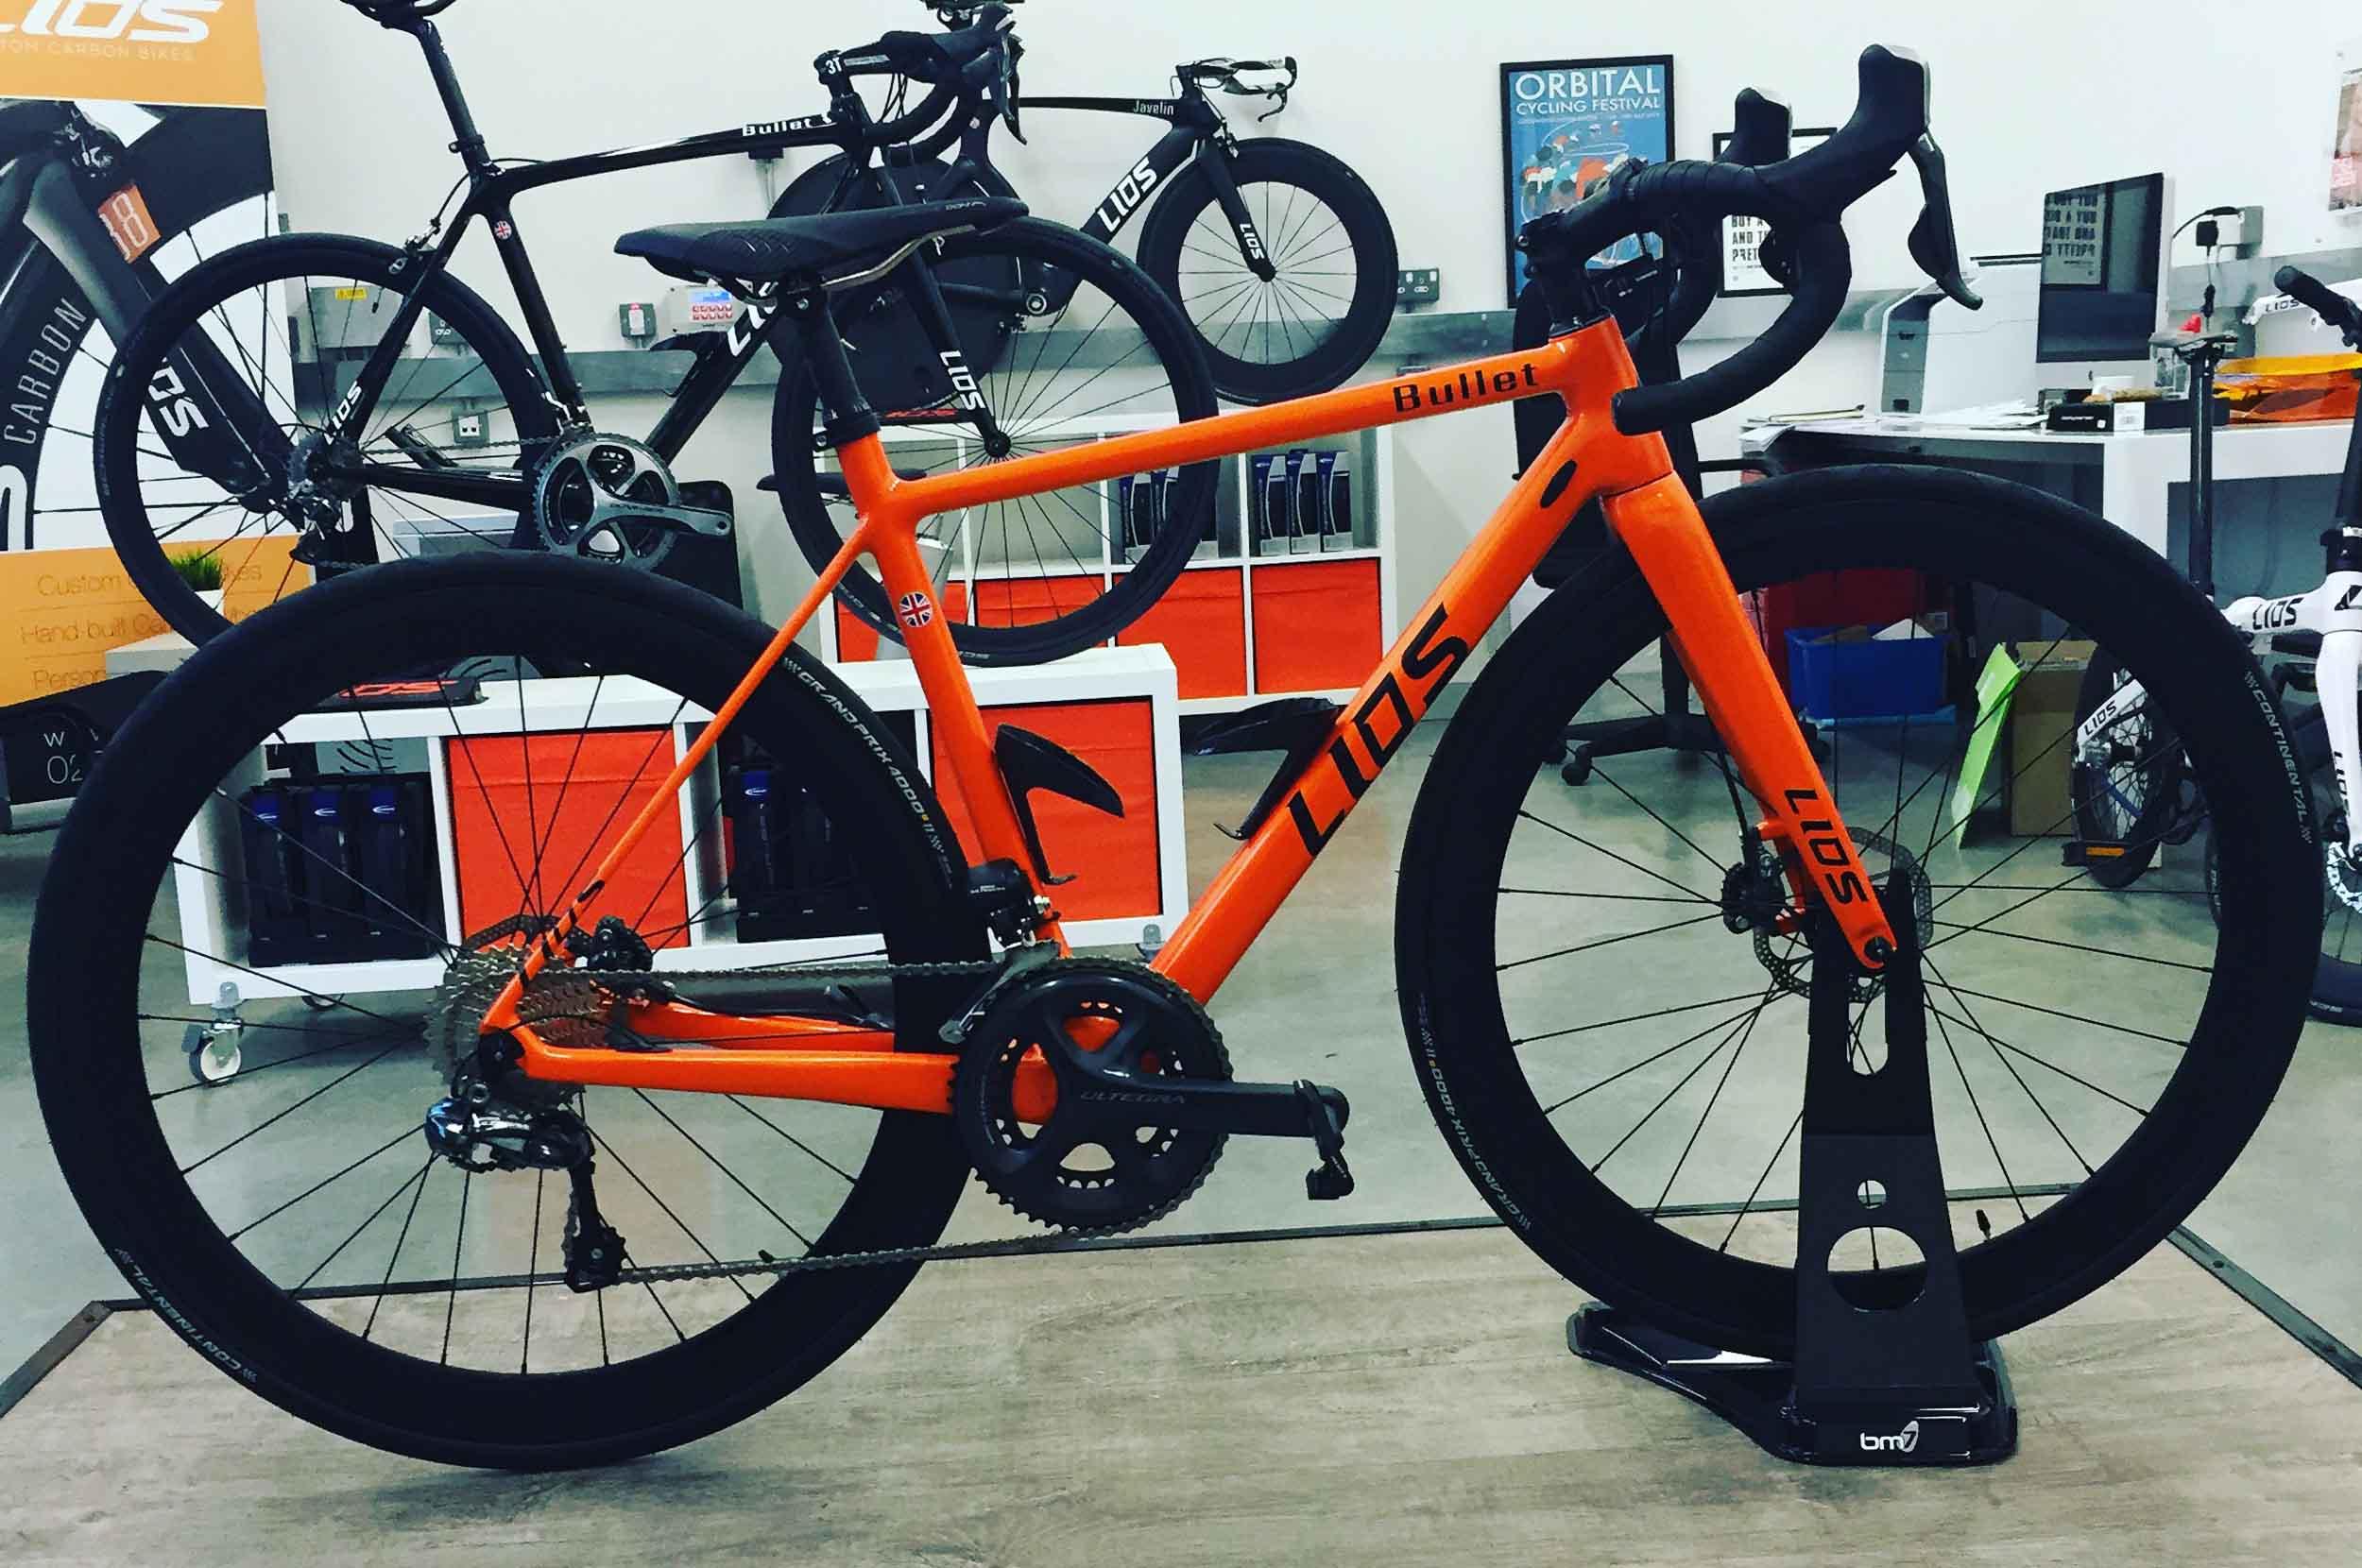 lios-bikes-custom-bike-orange-image-1.jpg